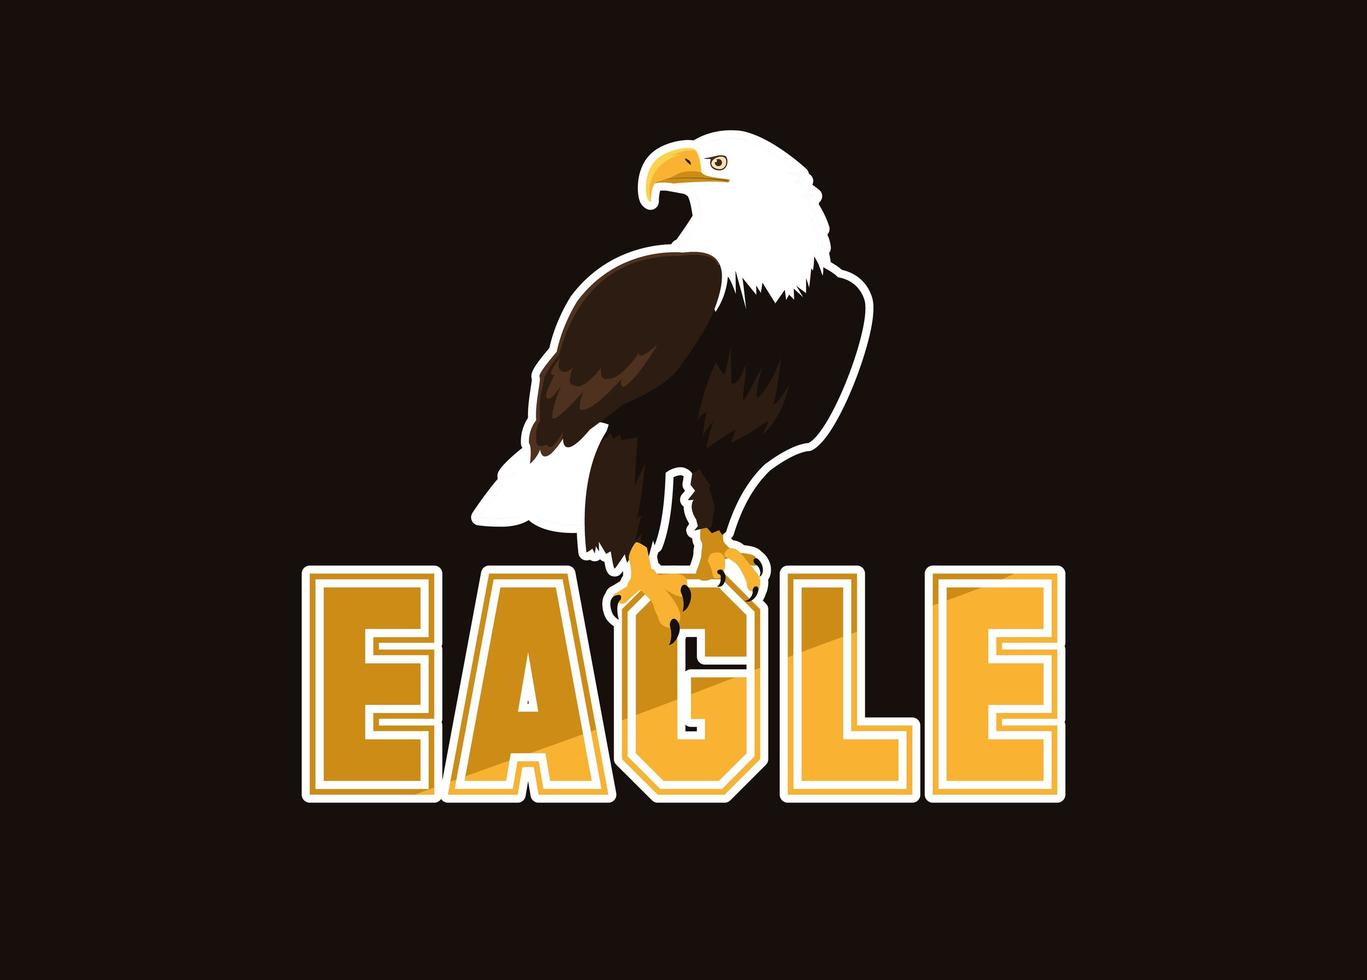 Bald eagle bird with word vector